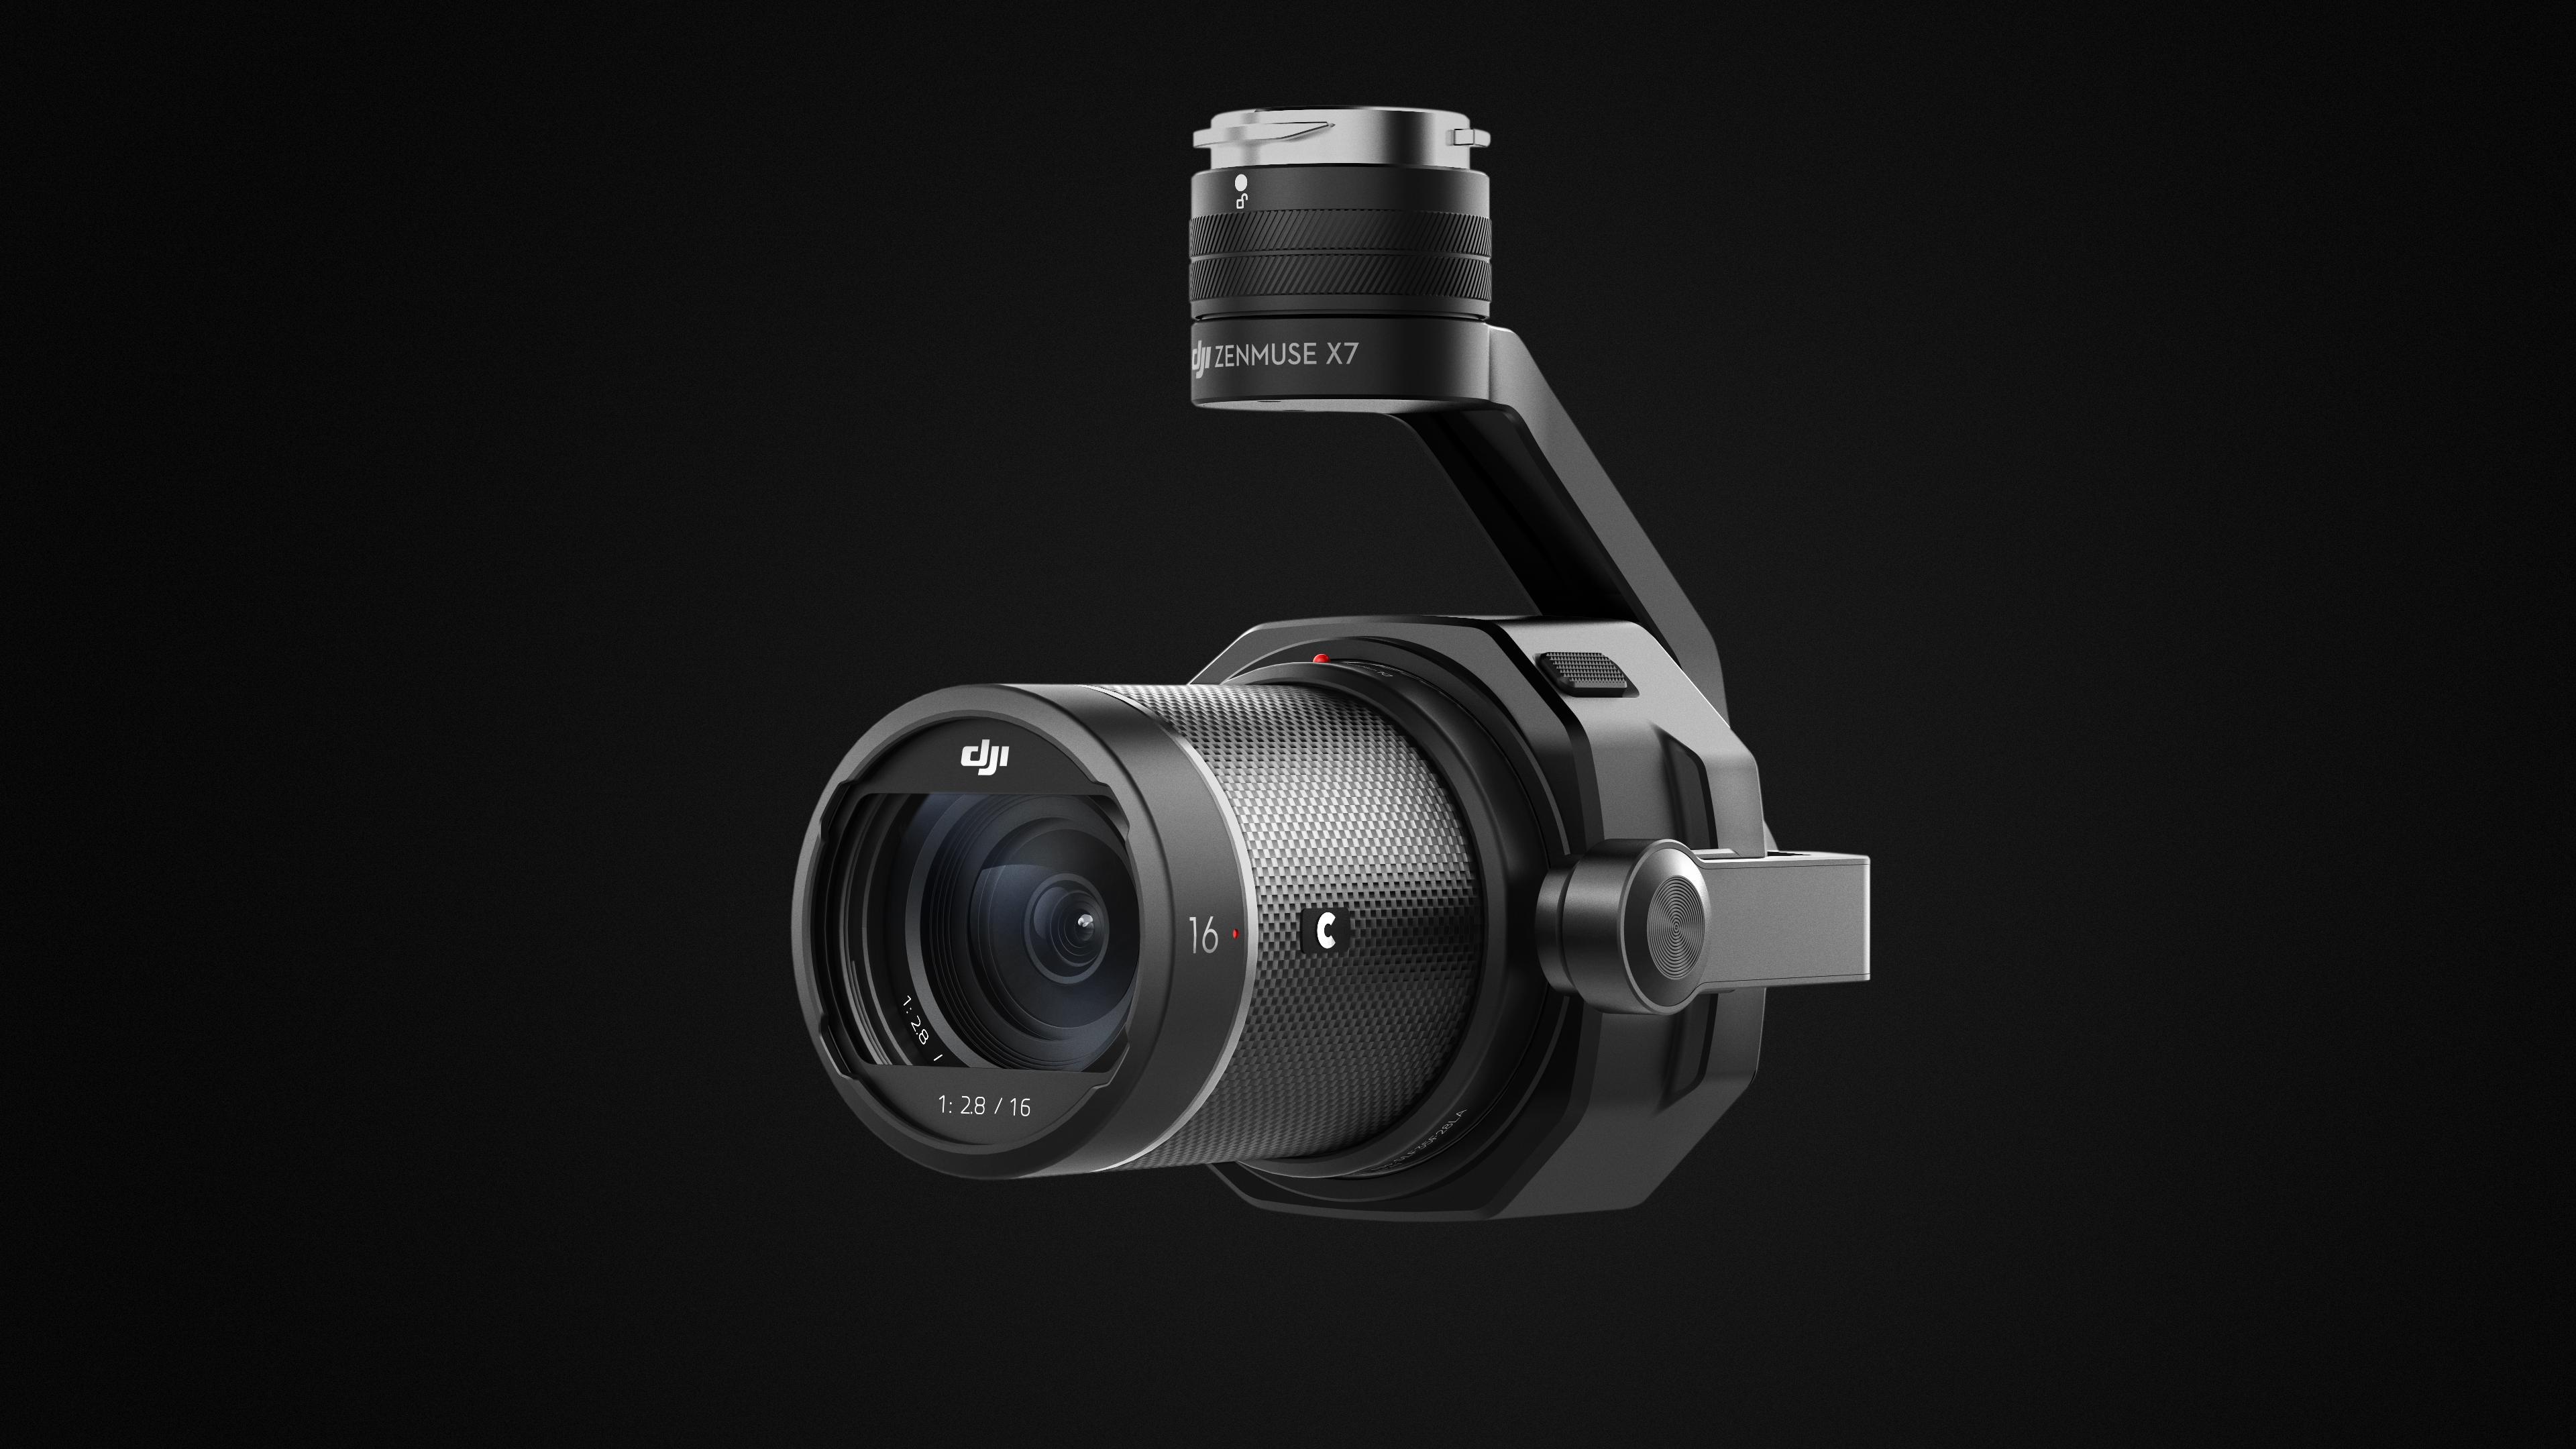 aerial cinematography, dji, drones, zenmuse x7, dji inspire 2, 6k video